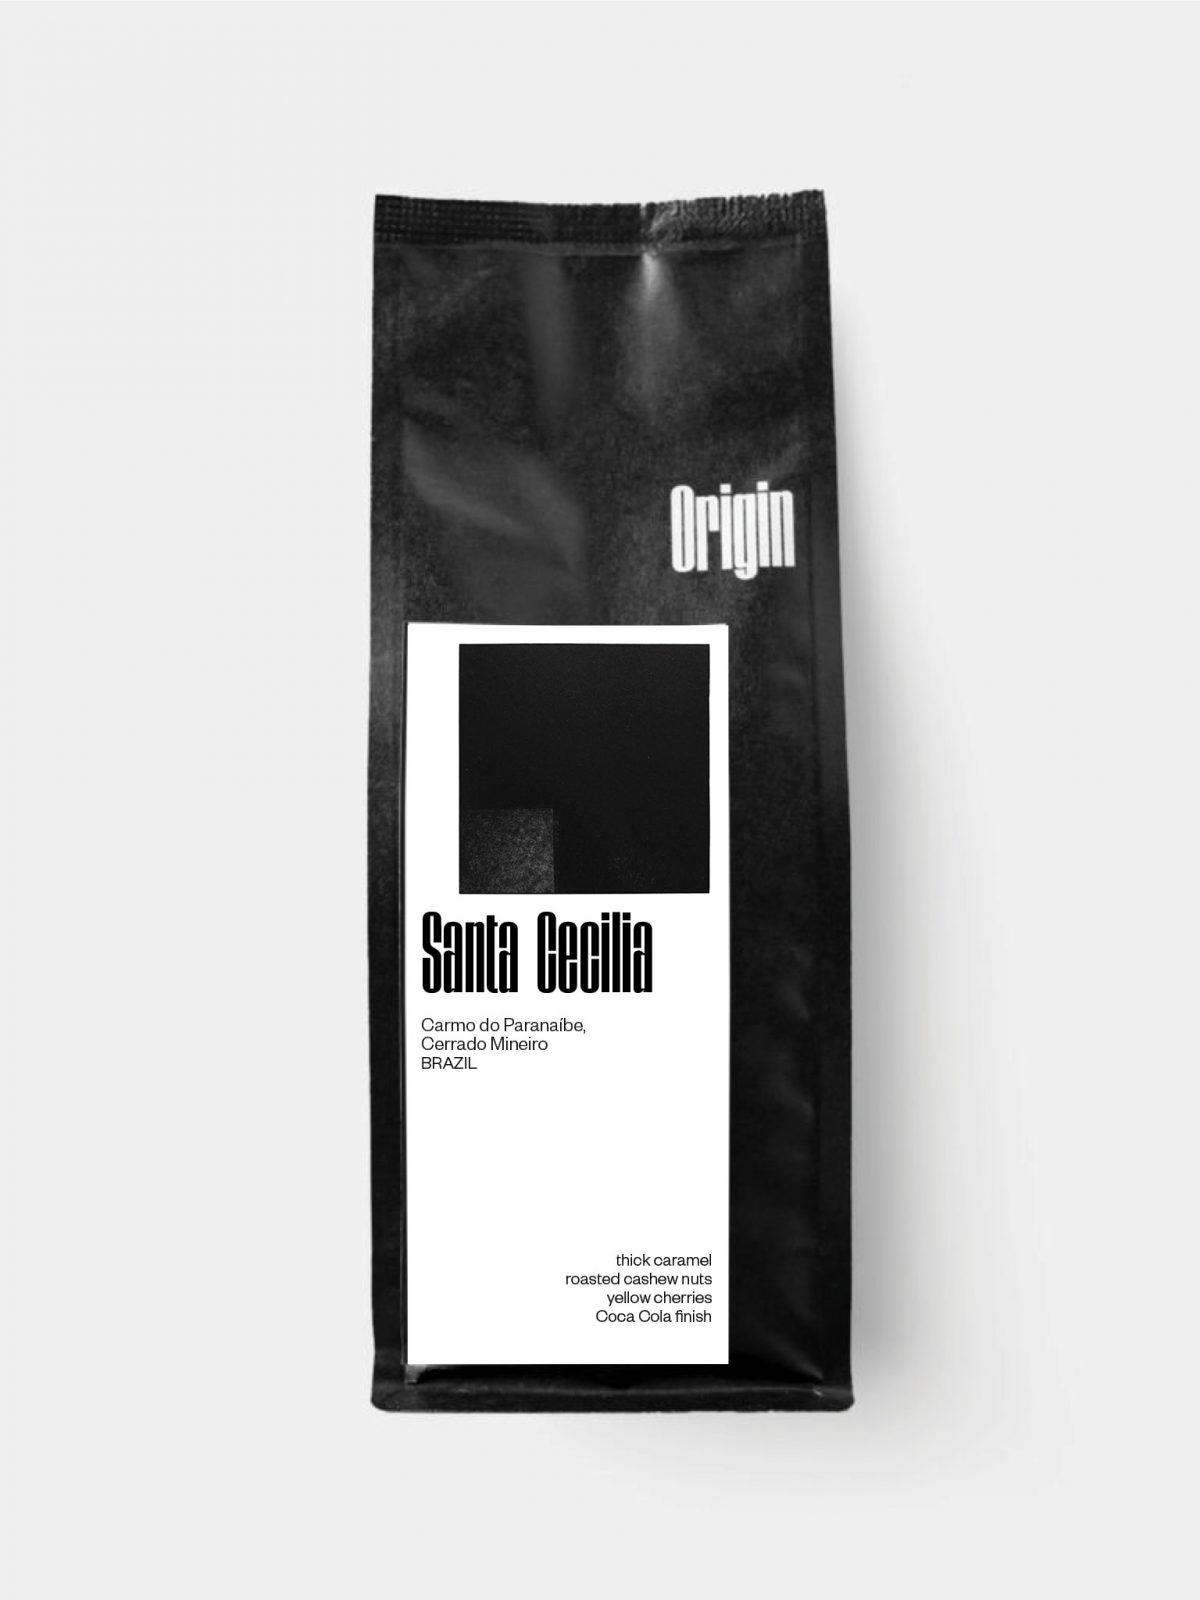 Brazil Santa Cecilia - On the 250g bag